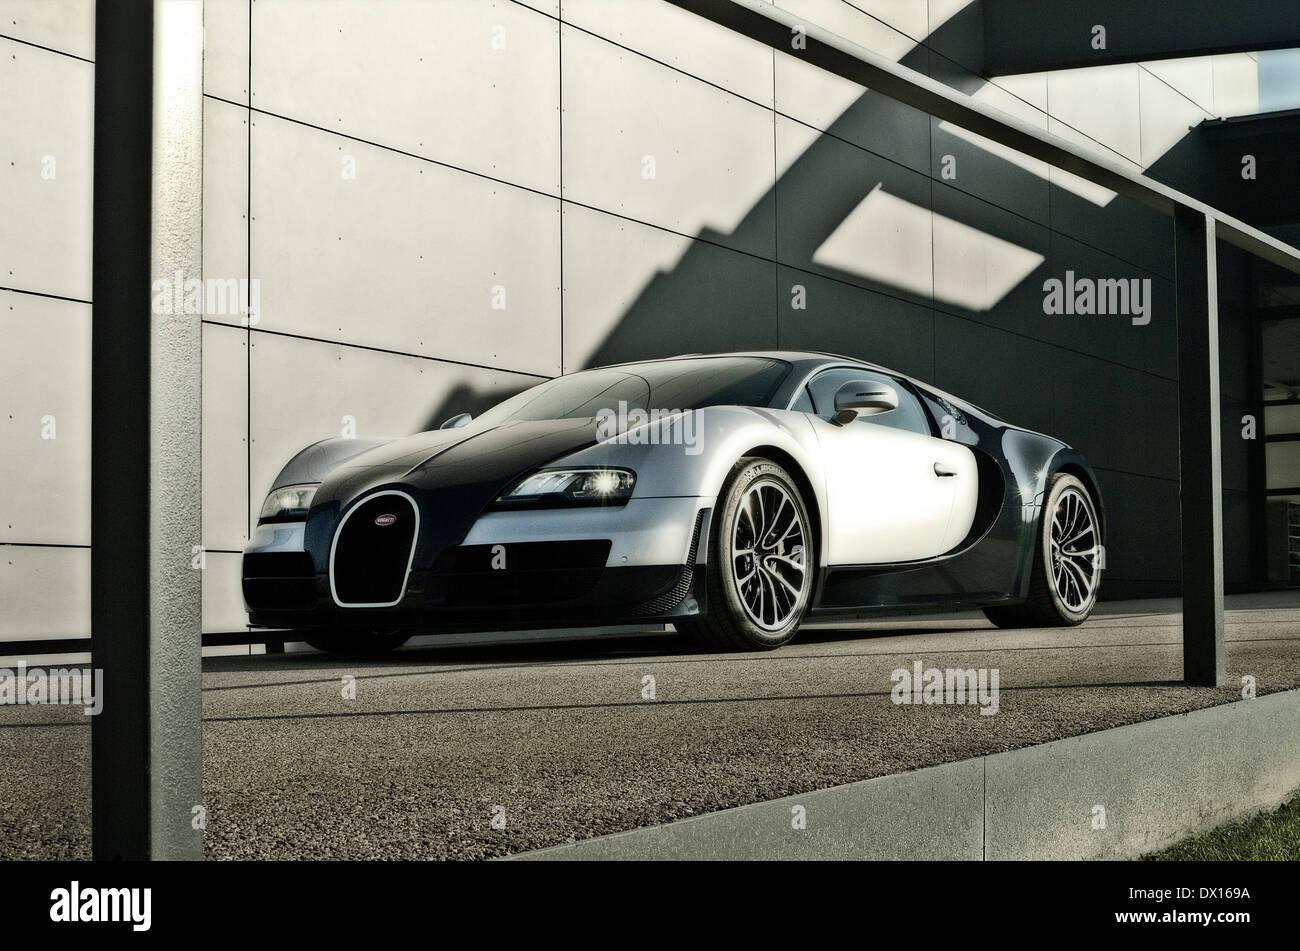 Bugatti Veyron Super Sport   Stock Image